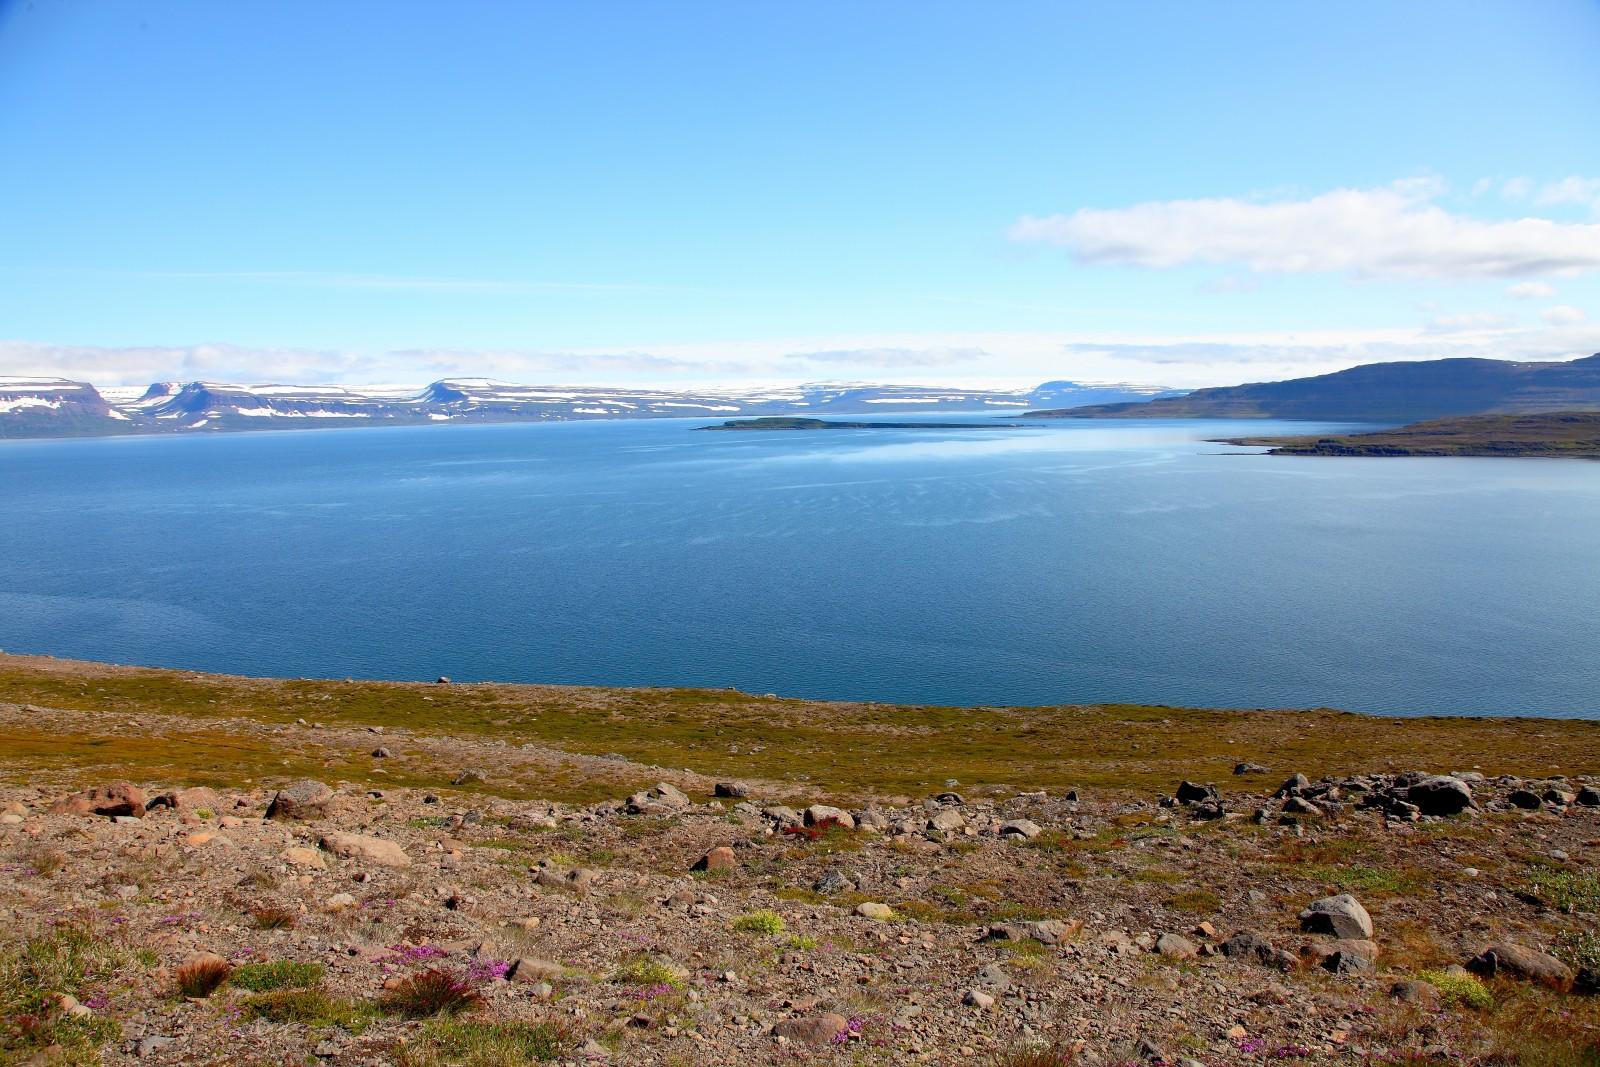 Le large fjord Ísafjarðardjúp